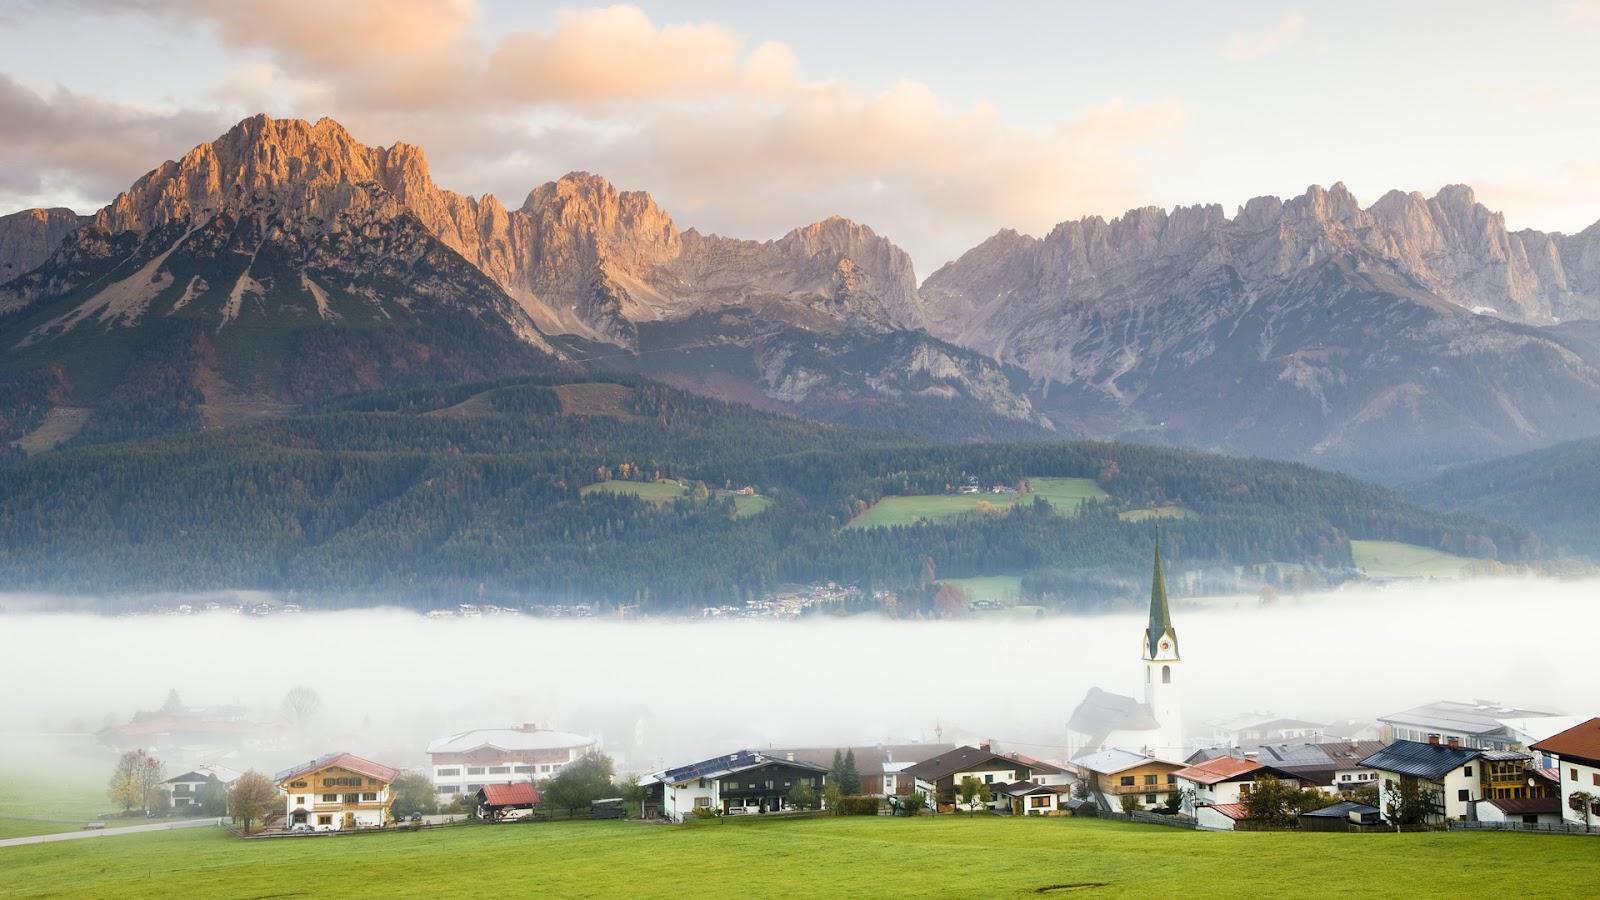 http://3.bp.blogspot.com/-Y8O2-KBV2Oo/UAfC4xi1ZfI/AAAAAAAADGk/IFQmWQSStNI/s1600/Ellmau+Village+in+Fog%252C+Tyrol%252C+Austria.jpg